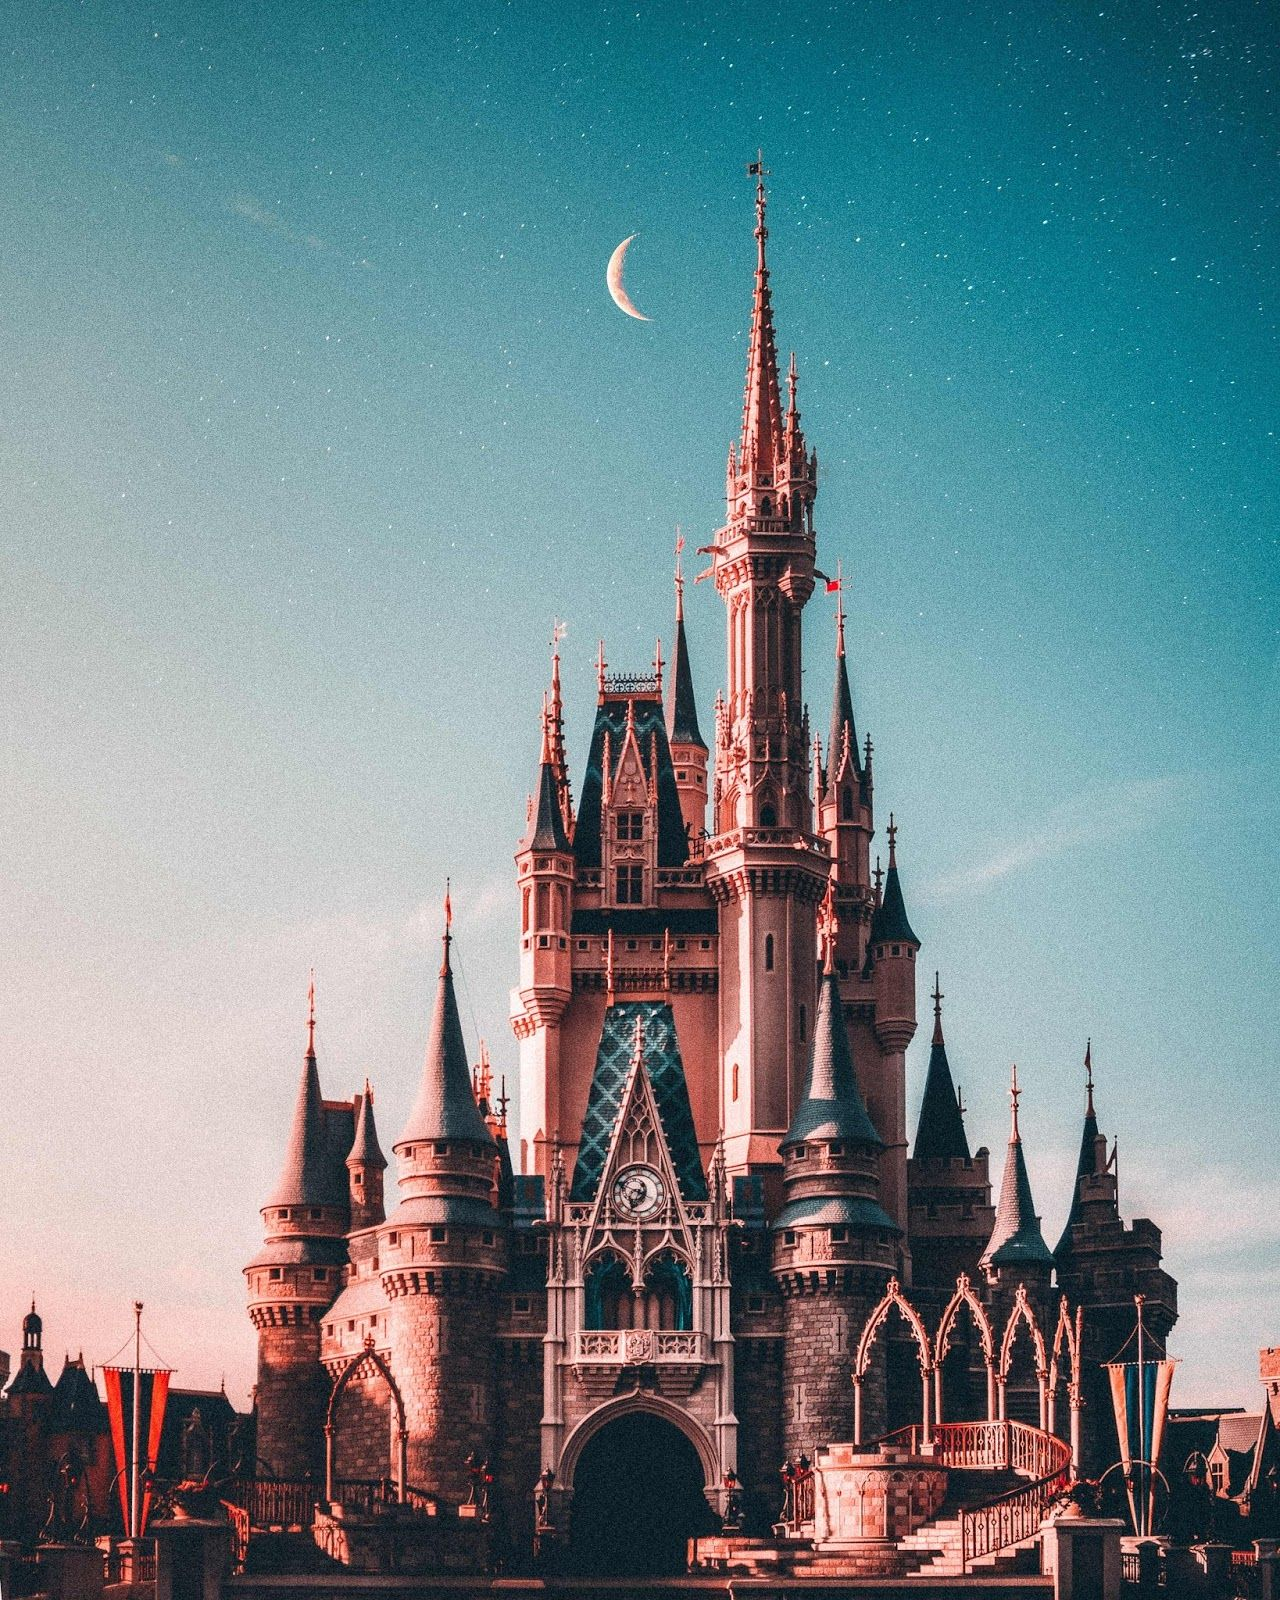 Best 4k Mobile Wallpapers Phone Wallpapers Hd Android Wallpaper Hd 1080p Disney Wallpaper Disney Castle Disneyland Castle